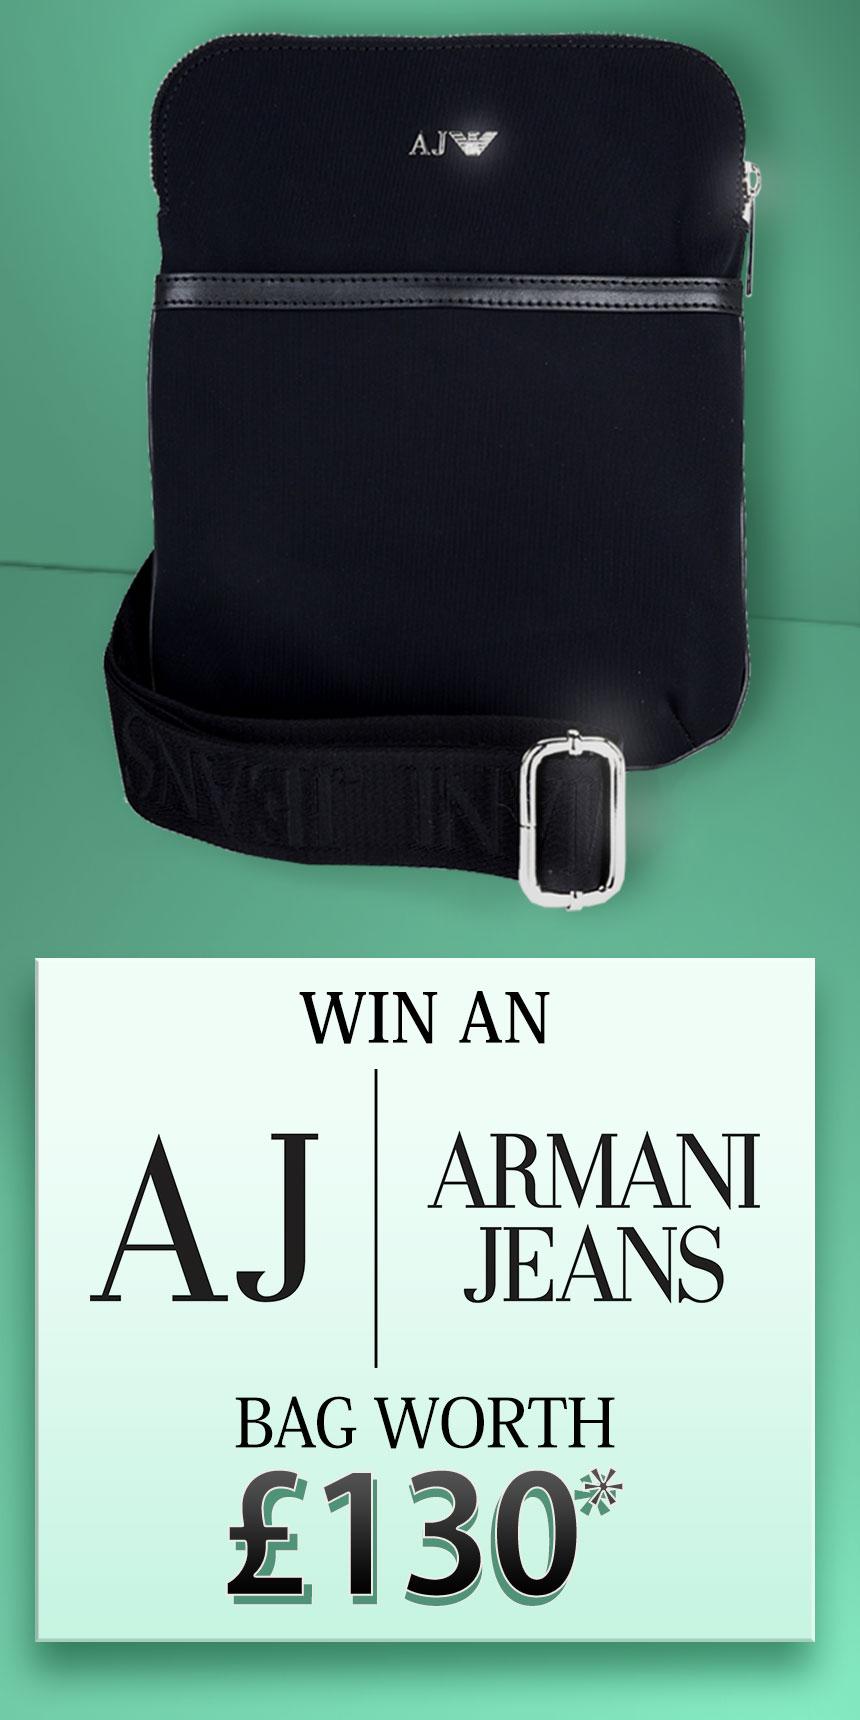 Win an Armani Jeans Bag Worth £130!